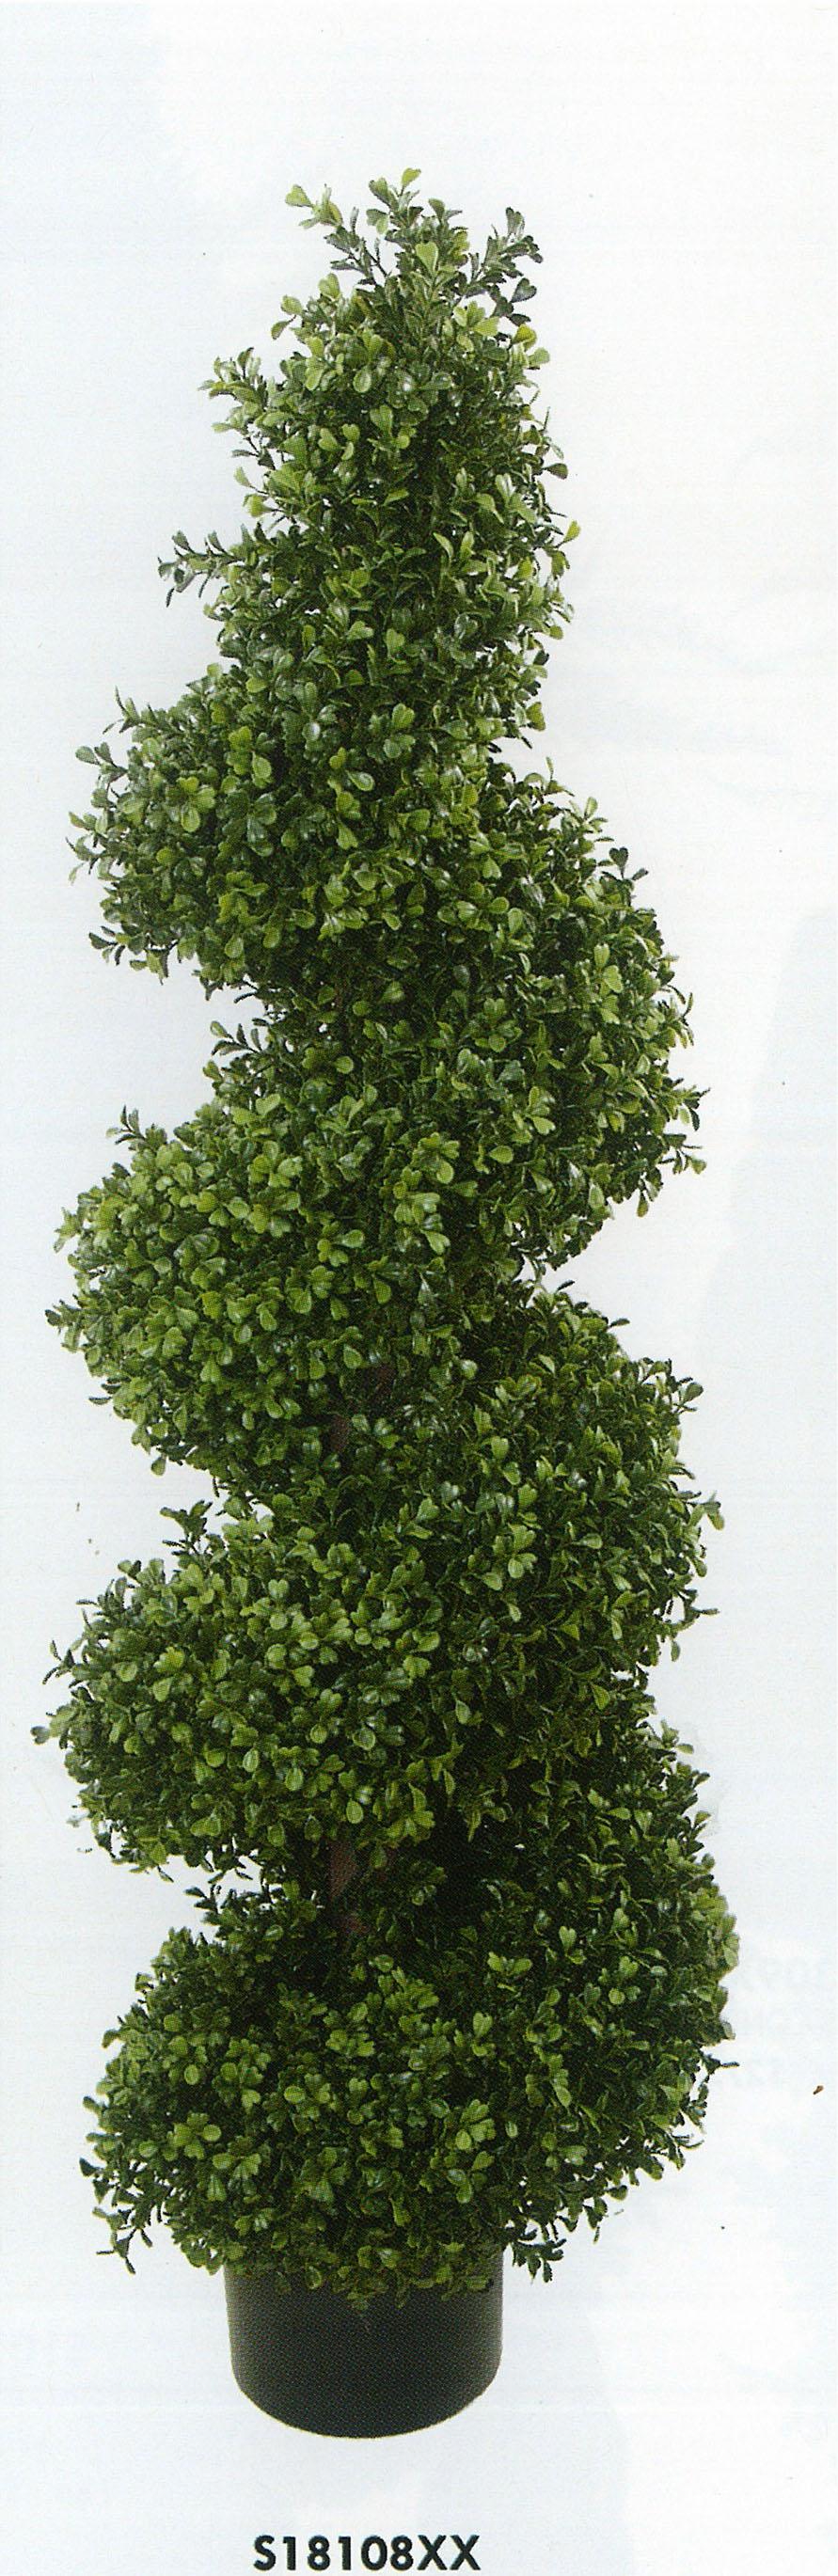 Spiral Boxwood hedge